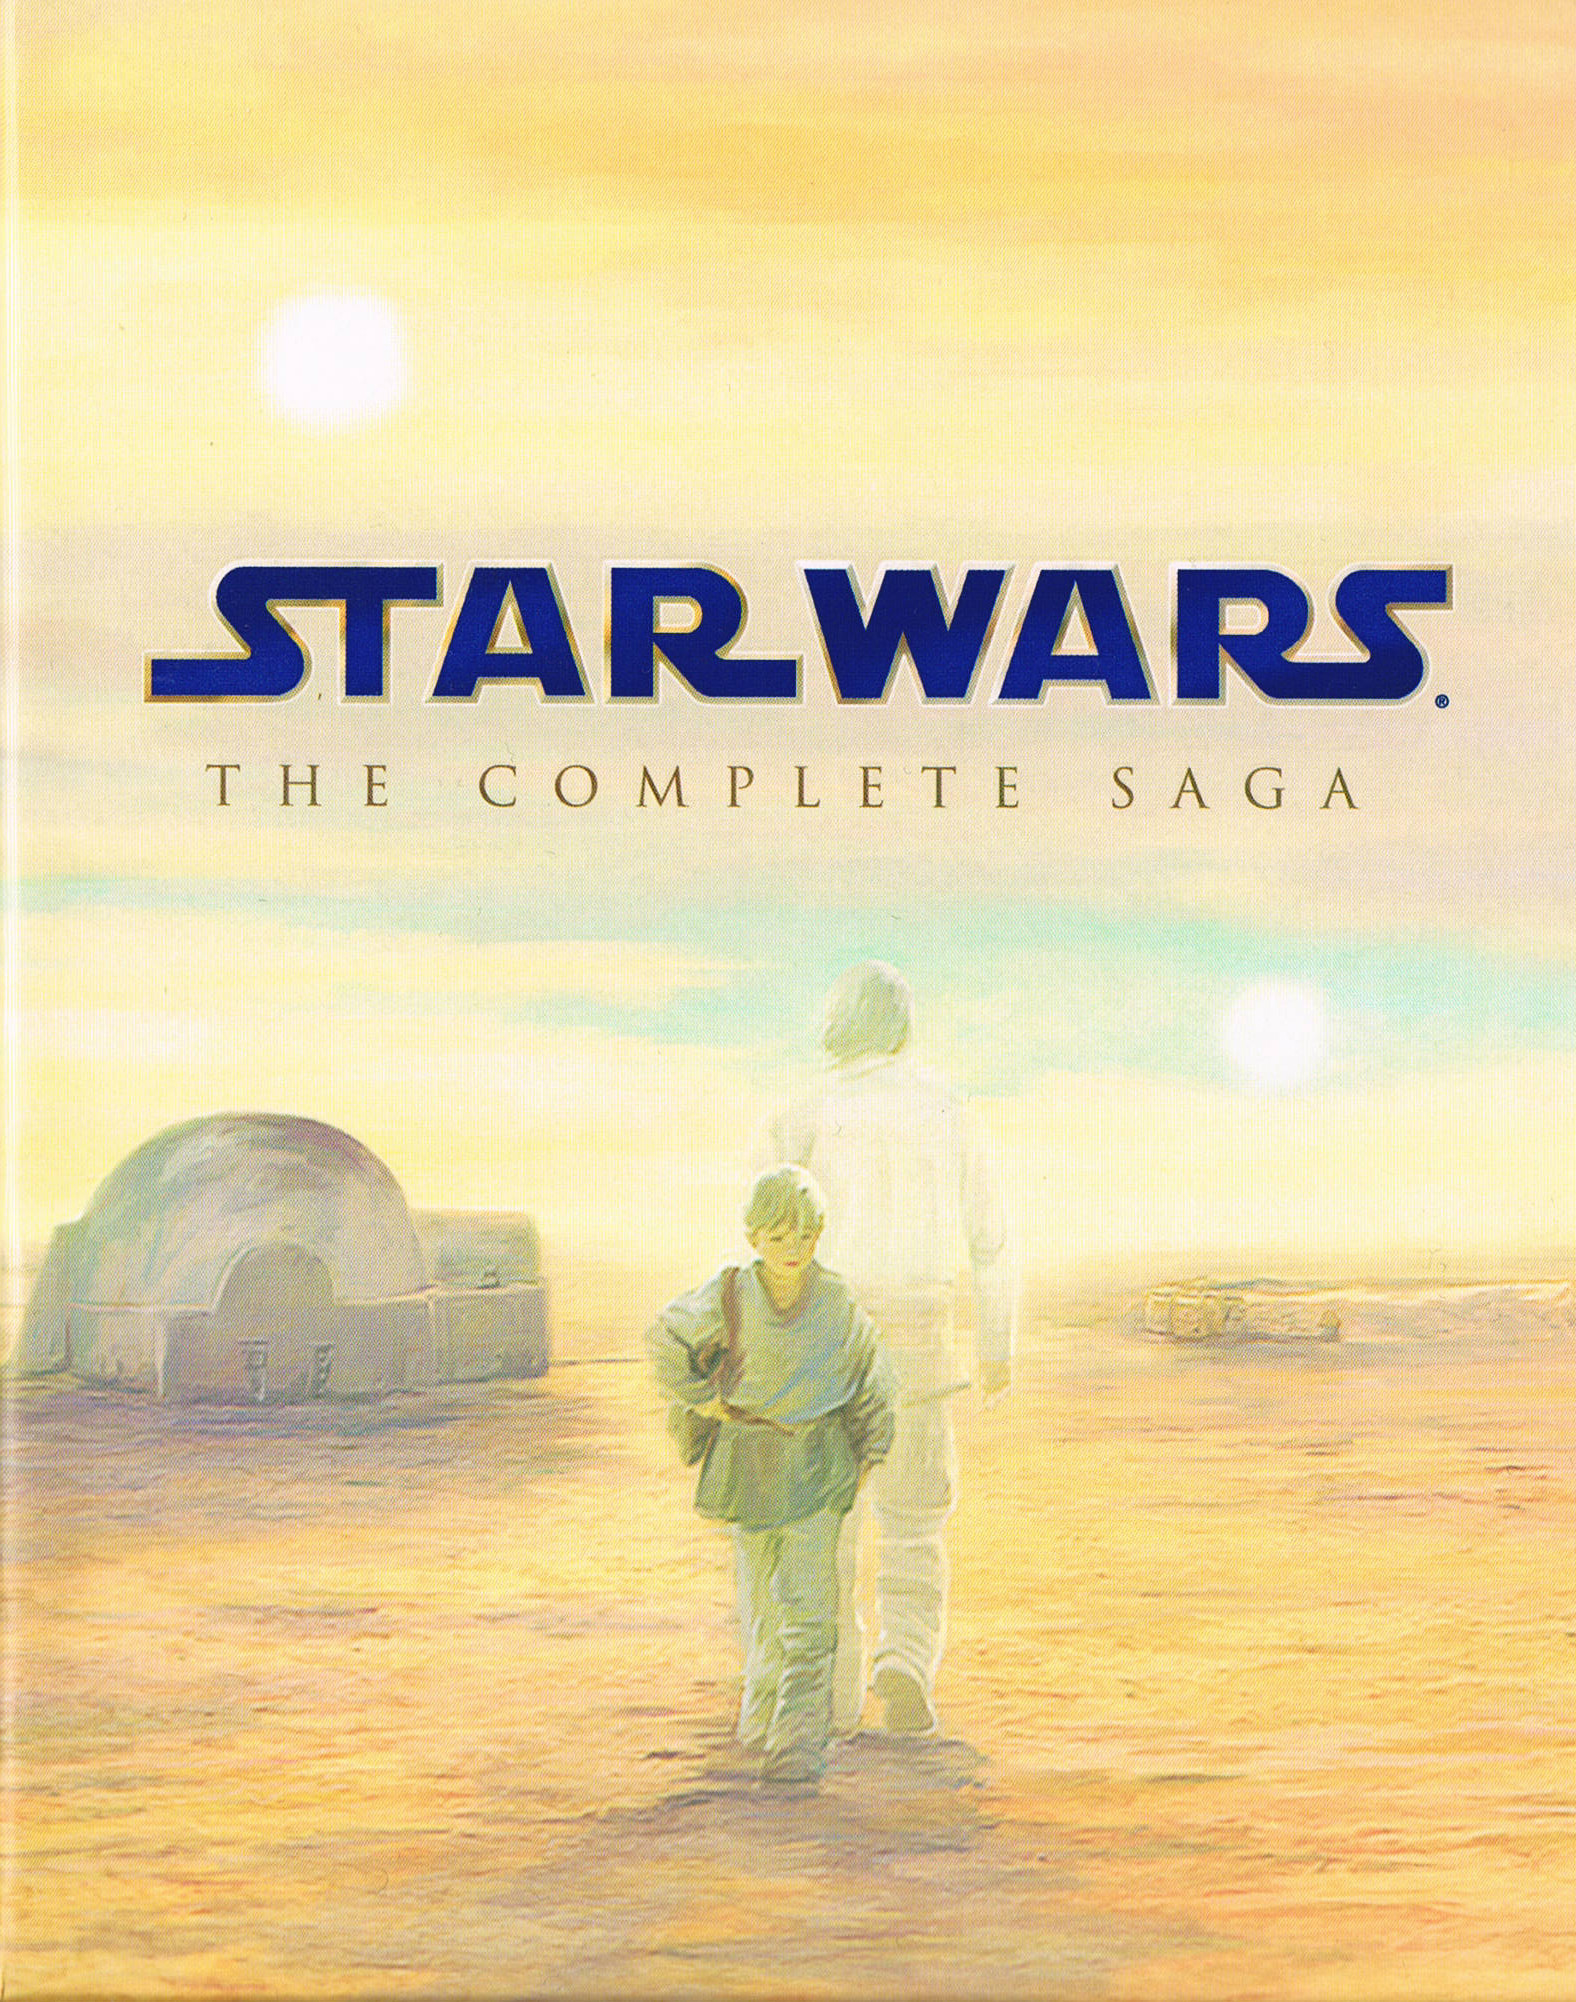 DCTV Folge 030 – Special: Star Wars Marathon